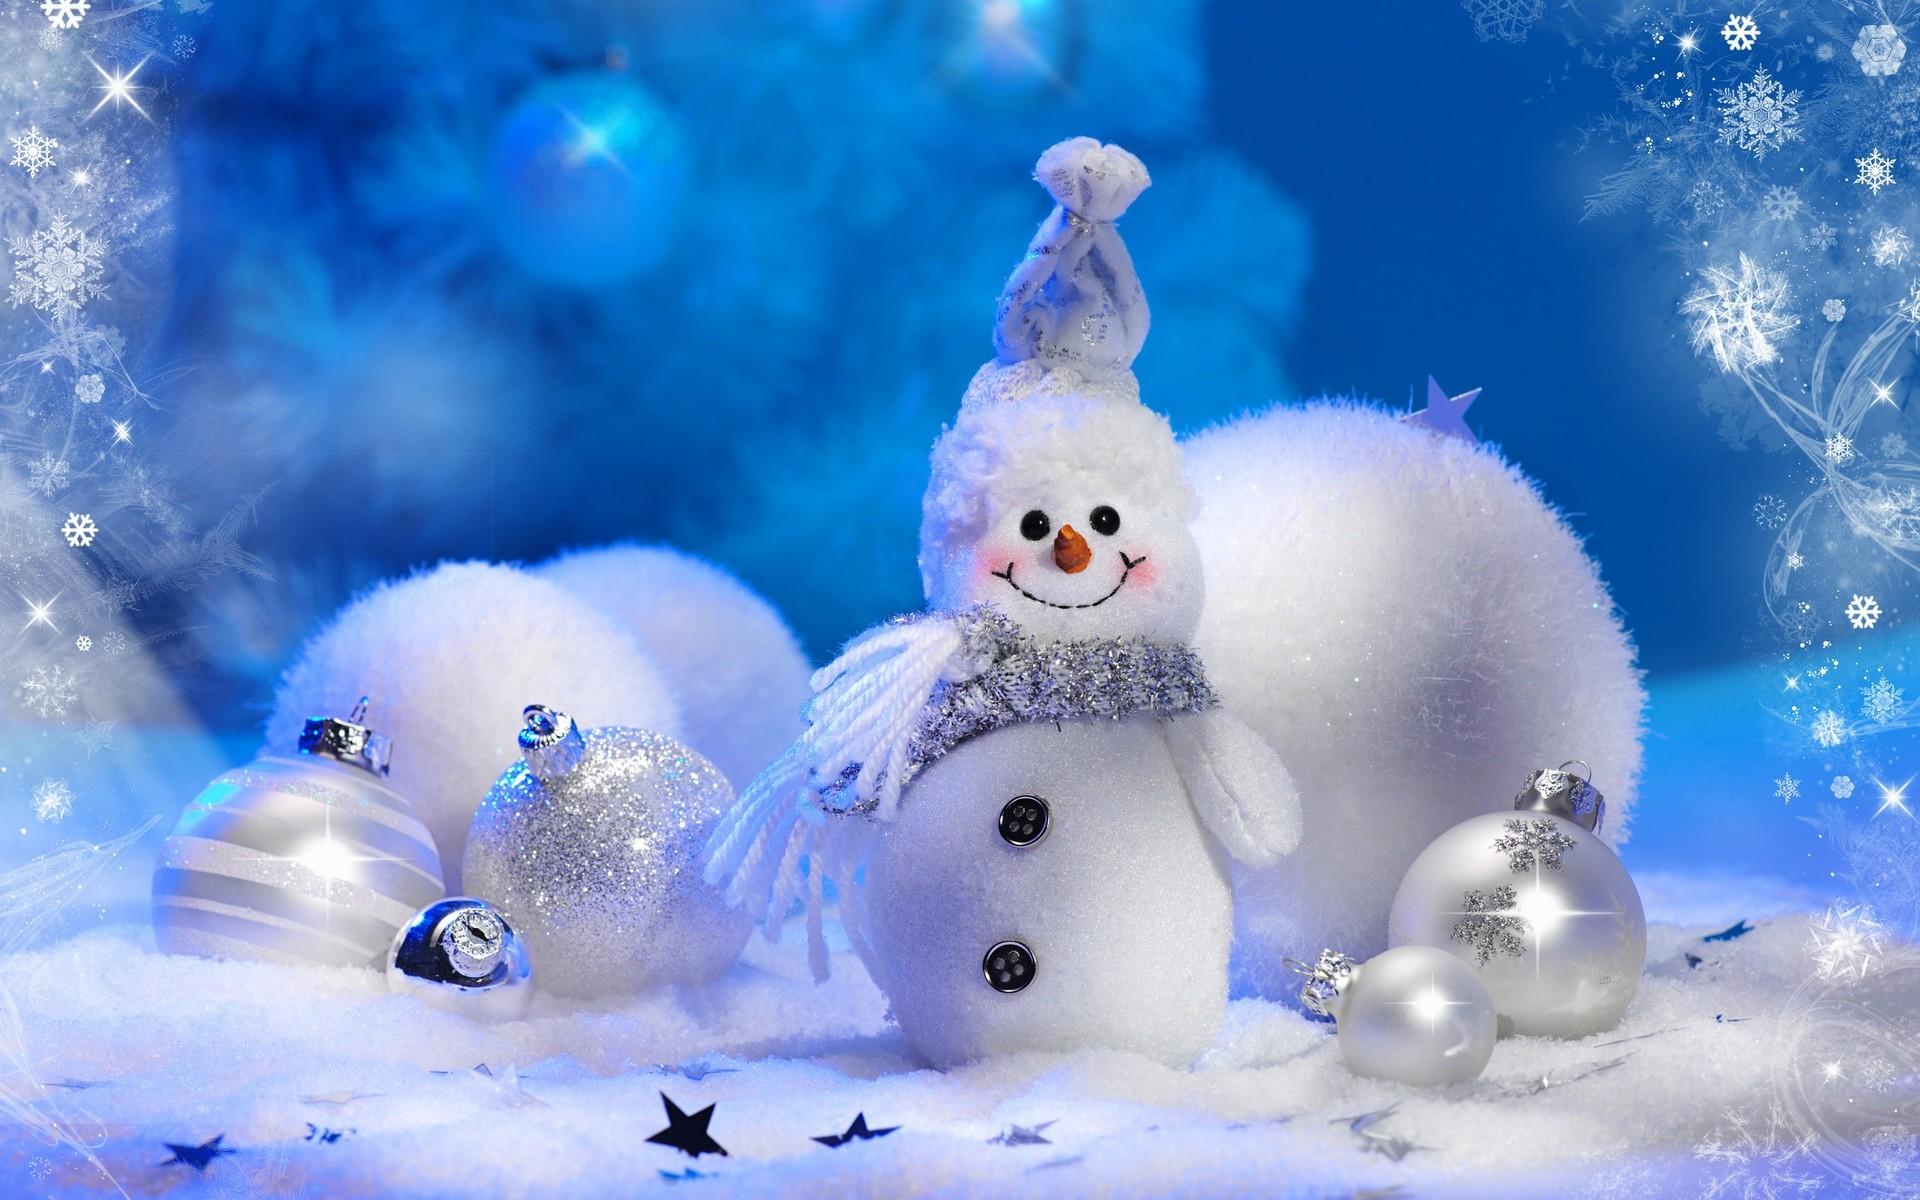 Free Christmas Wallpaper Downloads.Christmas Snow Scene Wallpaper Wallpapertag